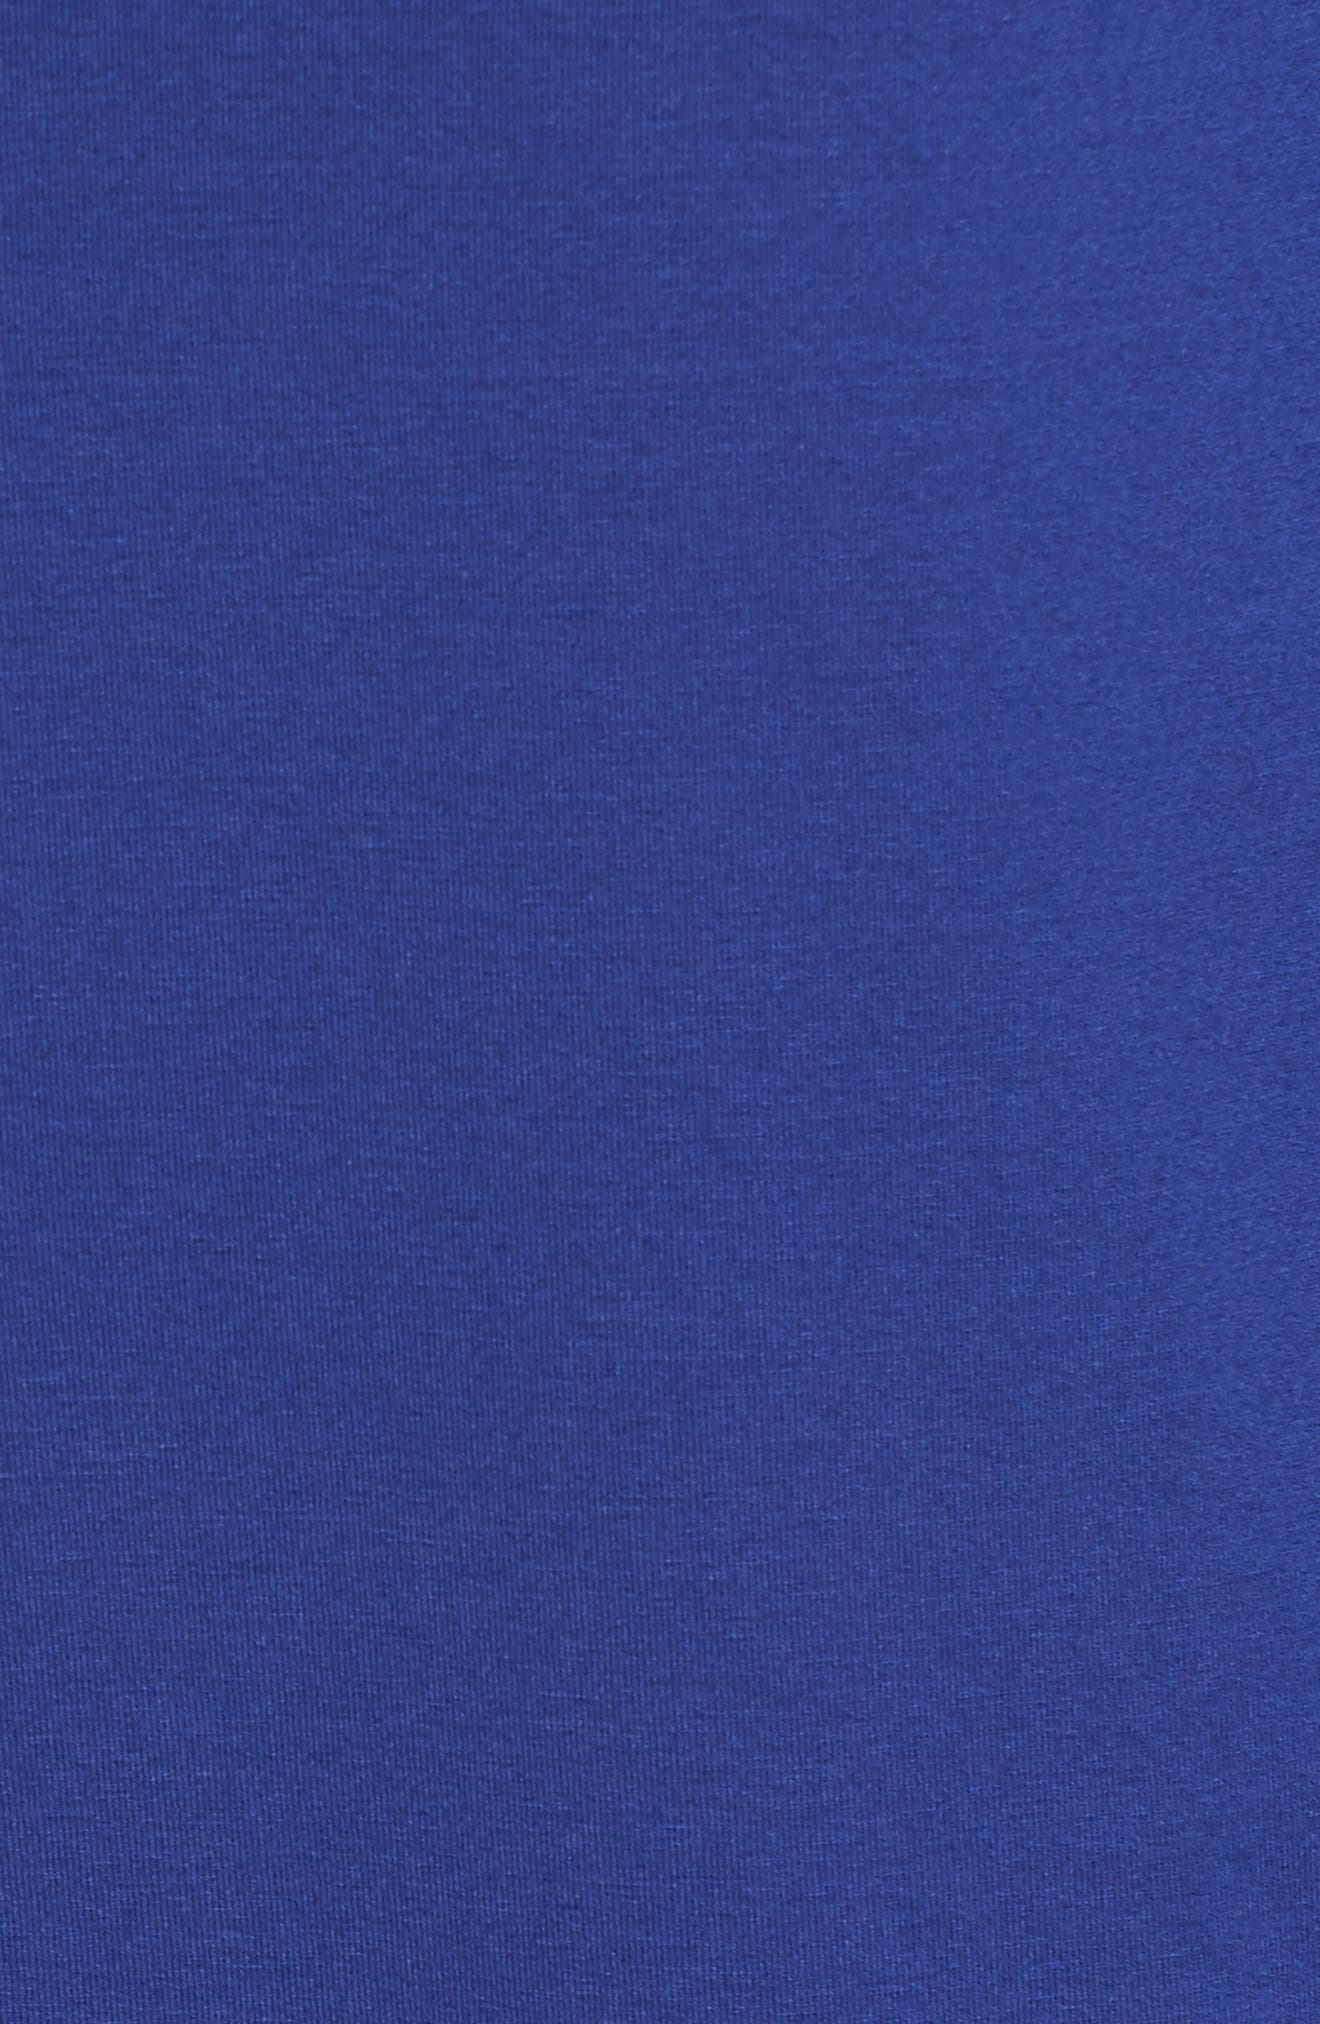 Jersey Bateau Neck Tunic,                             Alternate thumbnail 5, color,                             Persian Blue